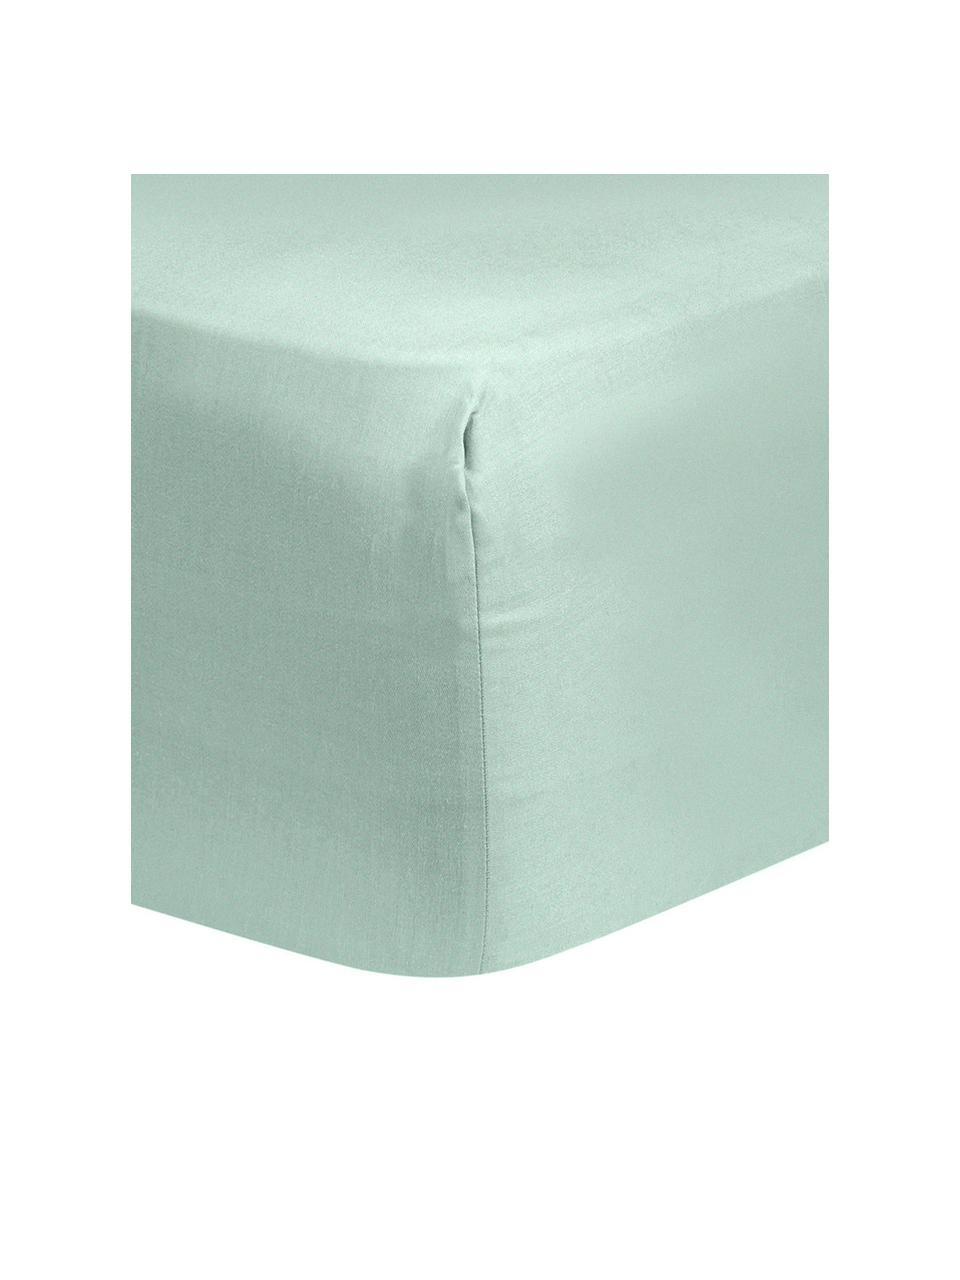 Lenzuolo con angoli in raso di cotone verde salvia Comfort, Verde salvia, Larg. 180 x Lung. 200 cm